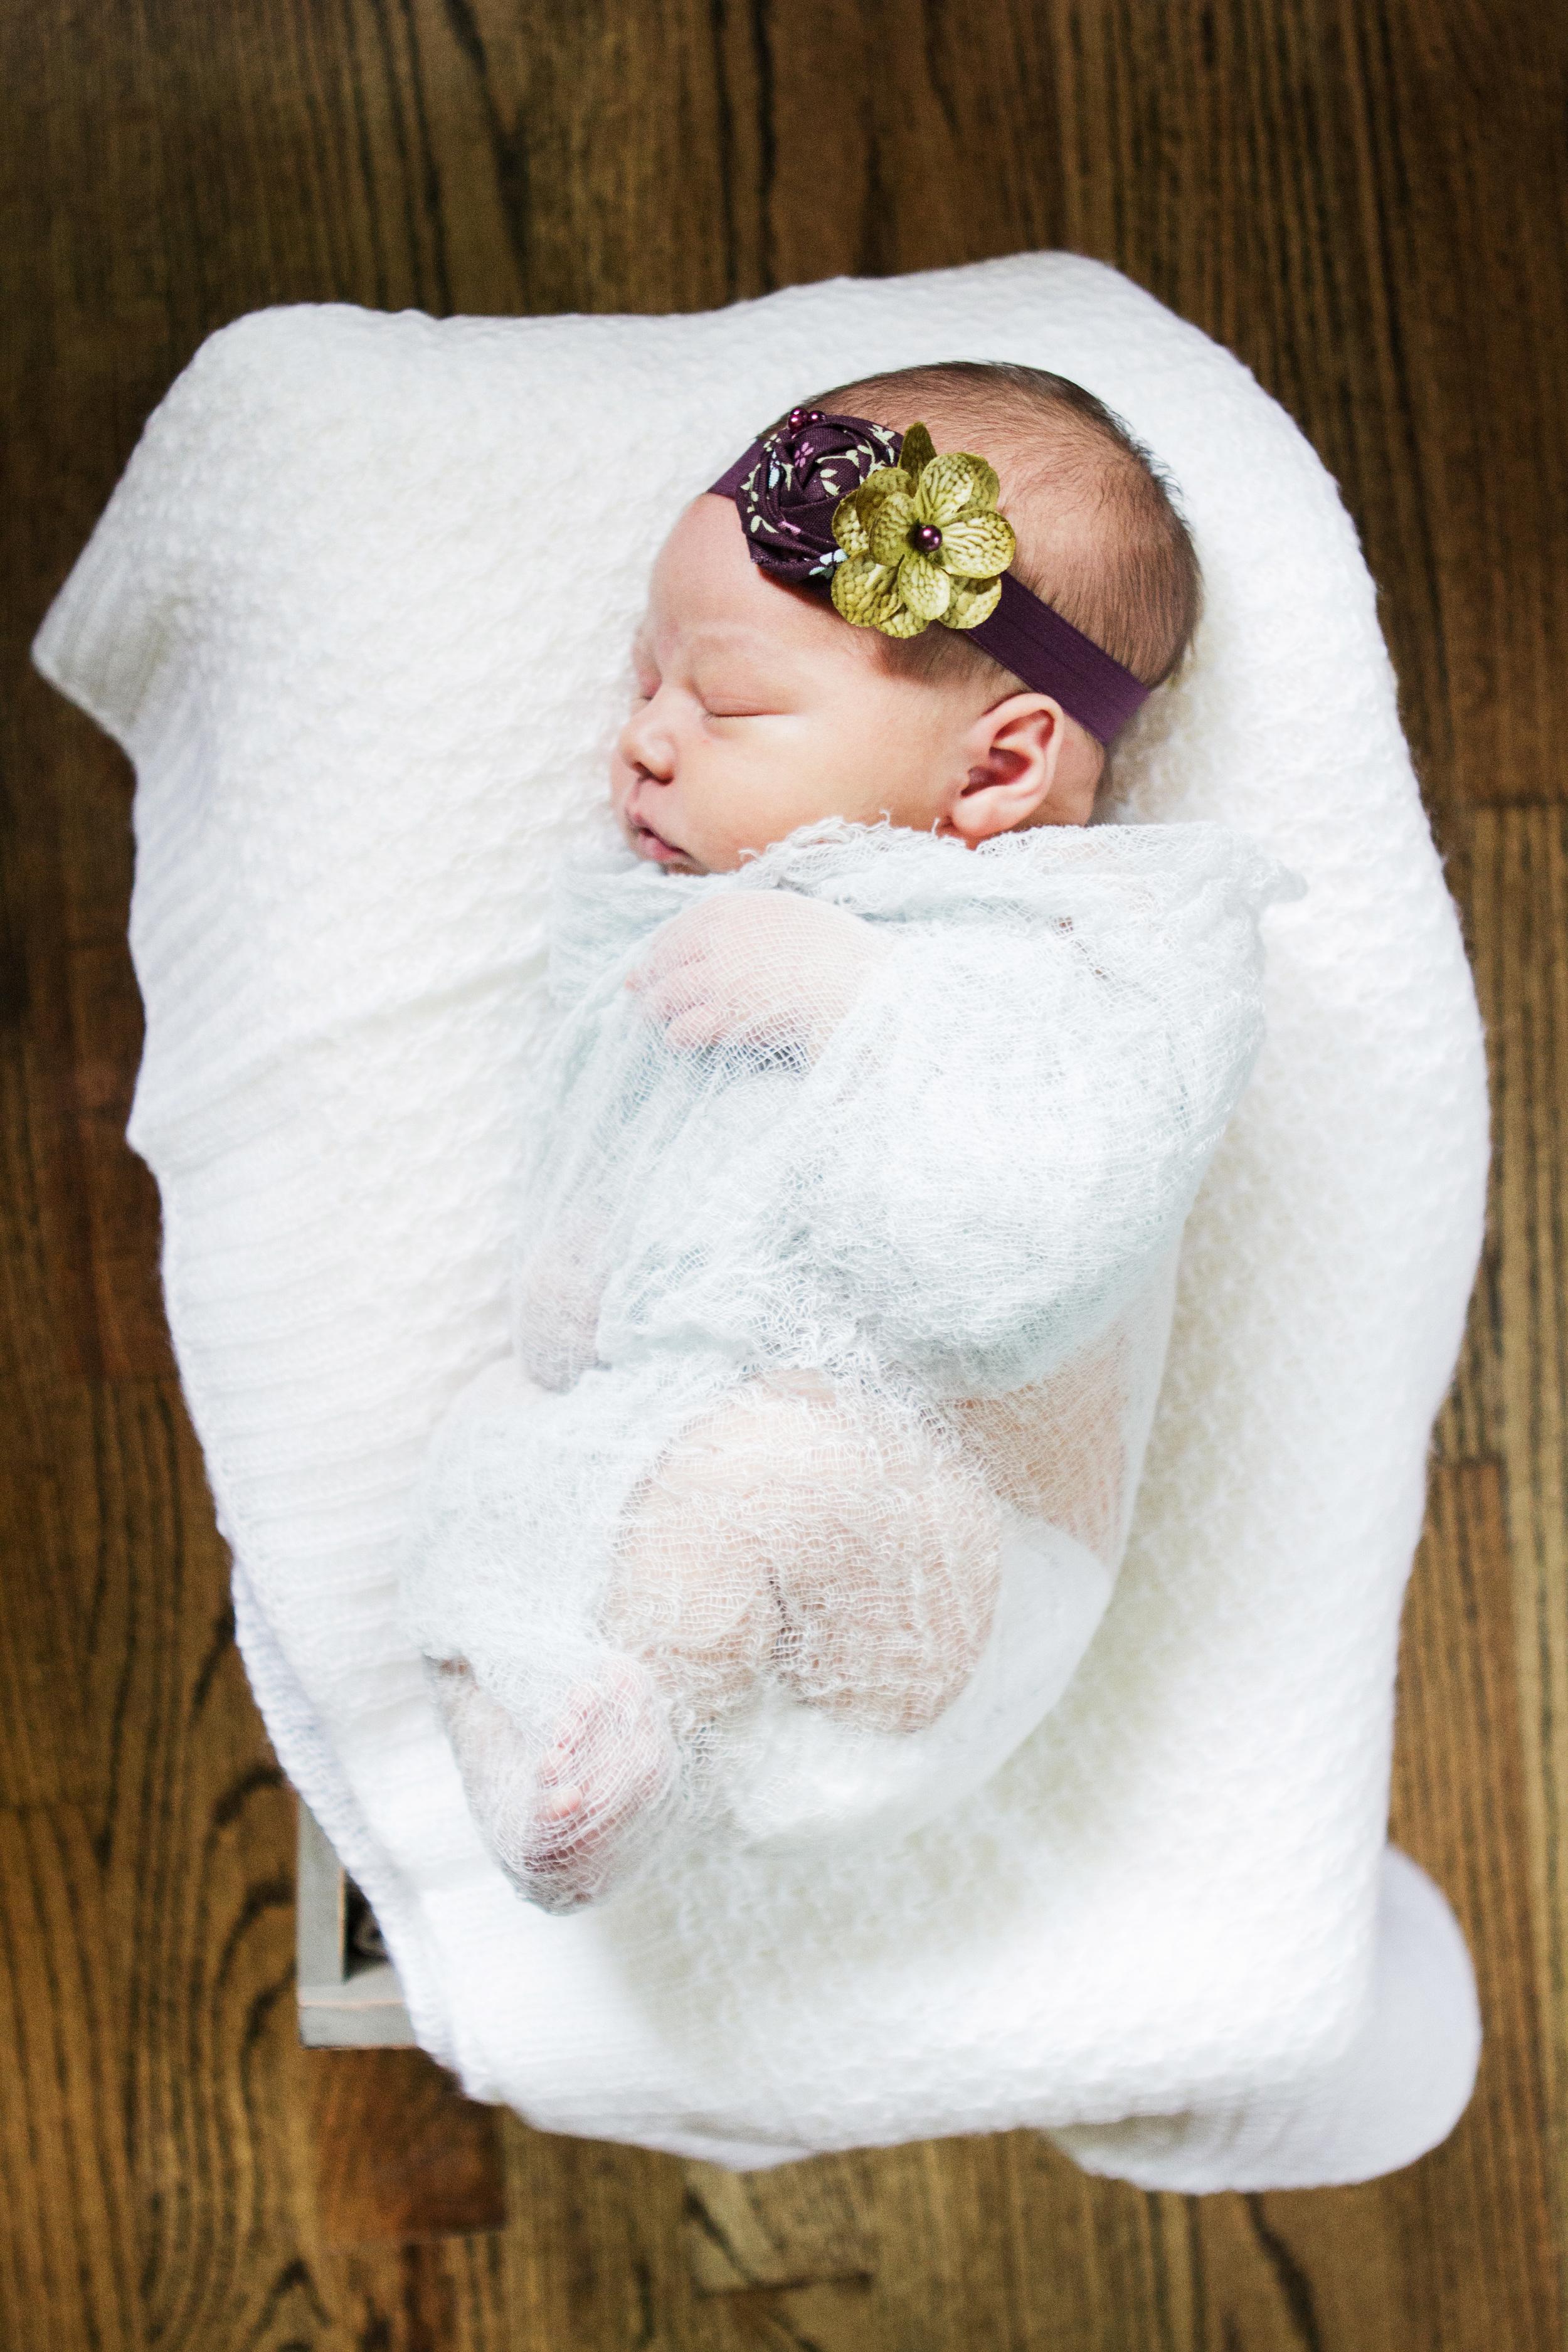 Fiona Hartford Newington Farmington West Hartford Connecticut Newborn Photographer At Home Sessions